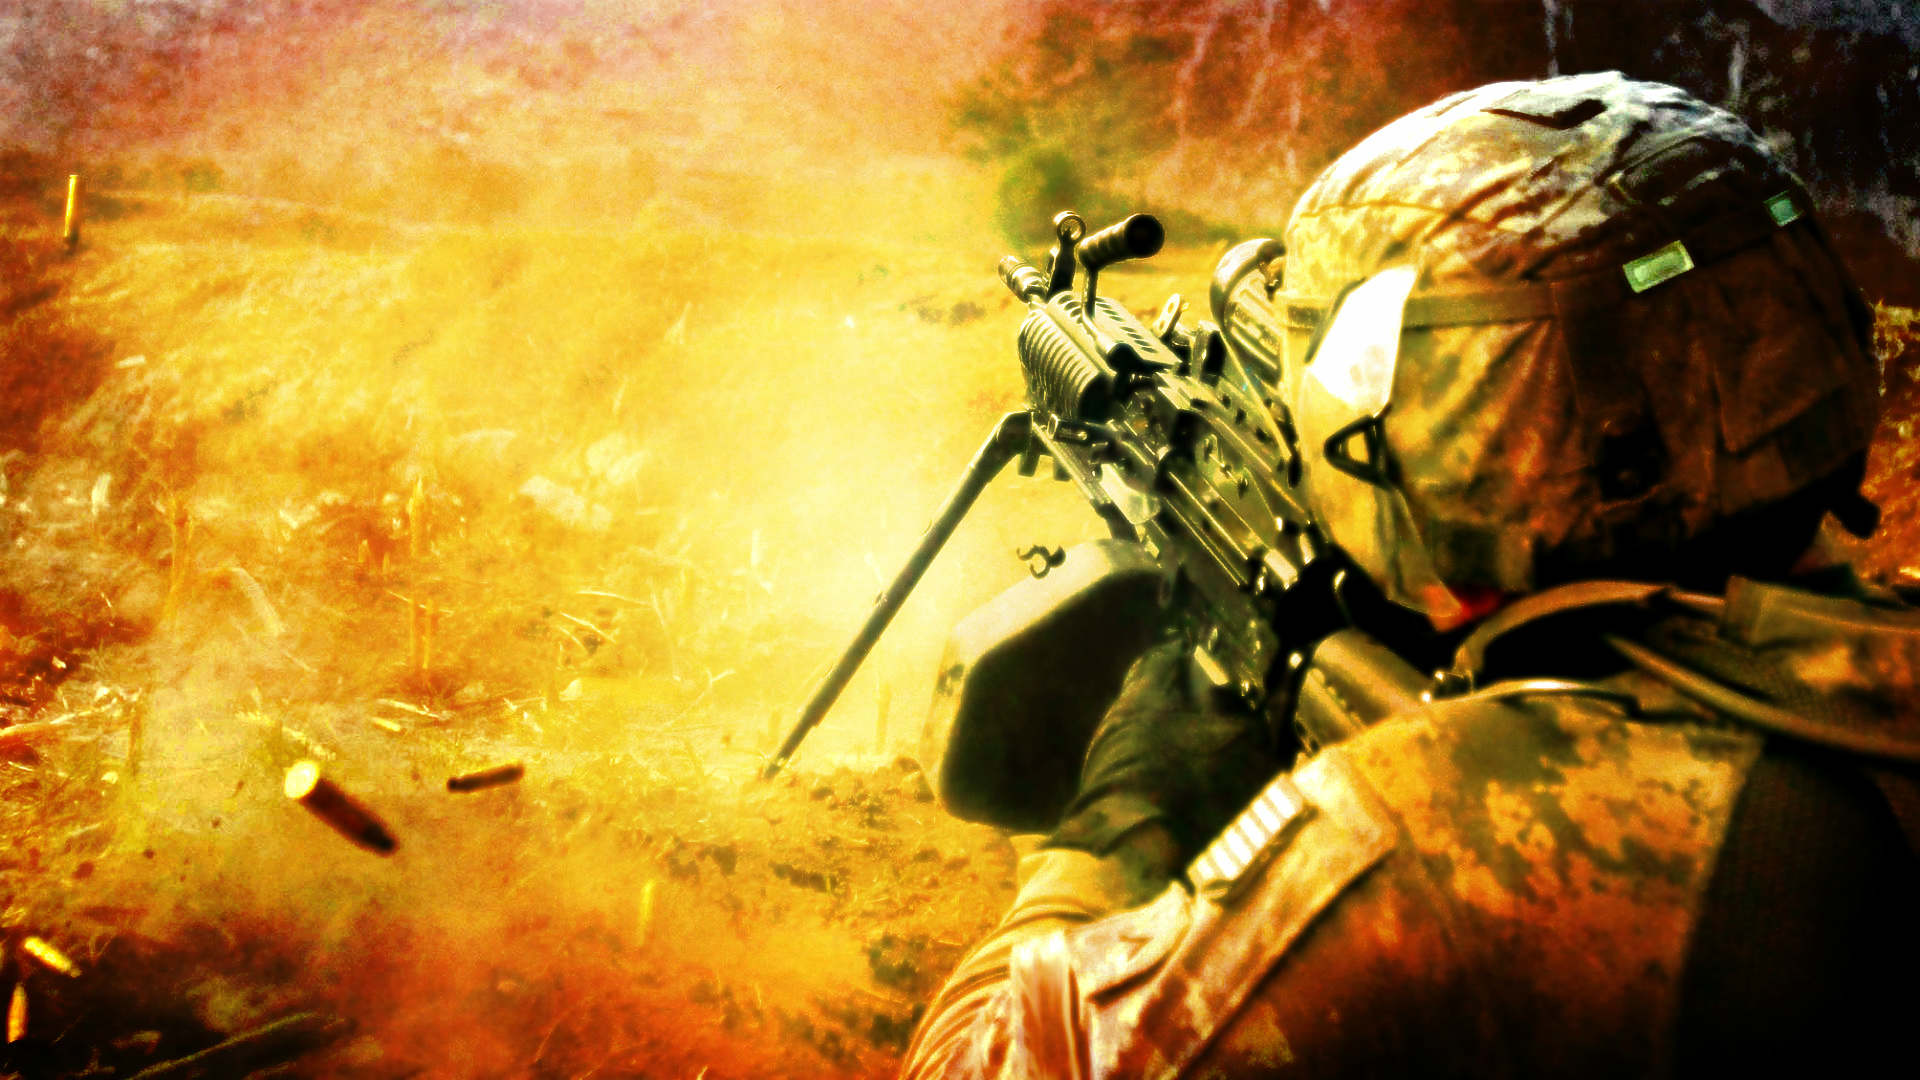 солдат стреляет из пулемёта. война. сон про путешествия во времени